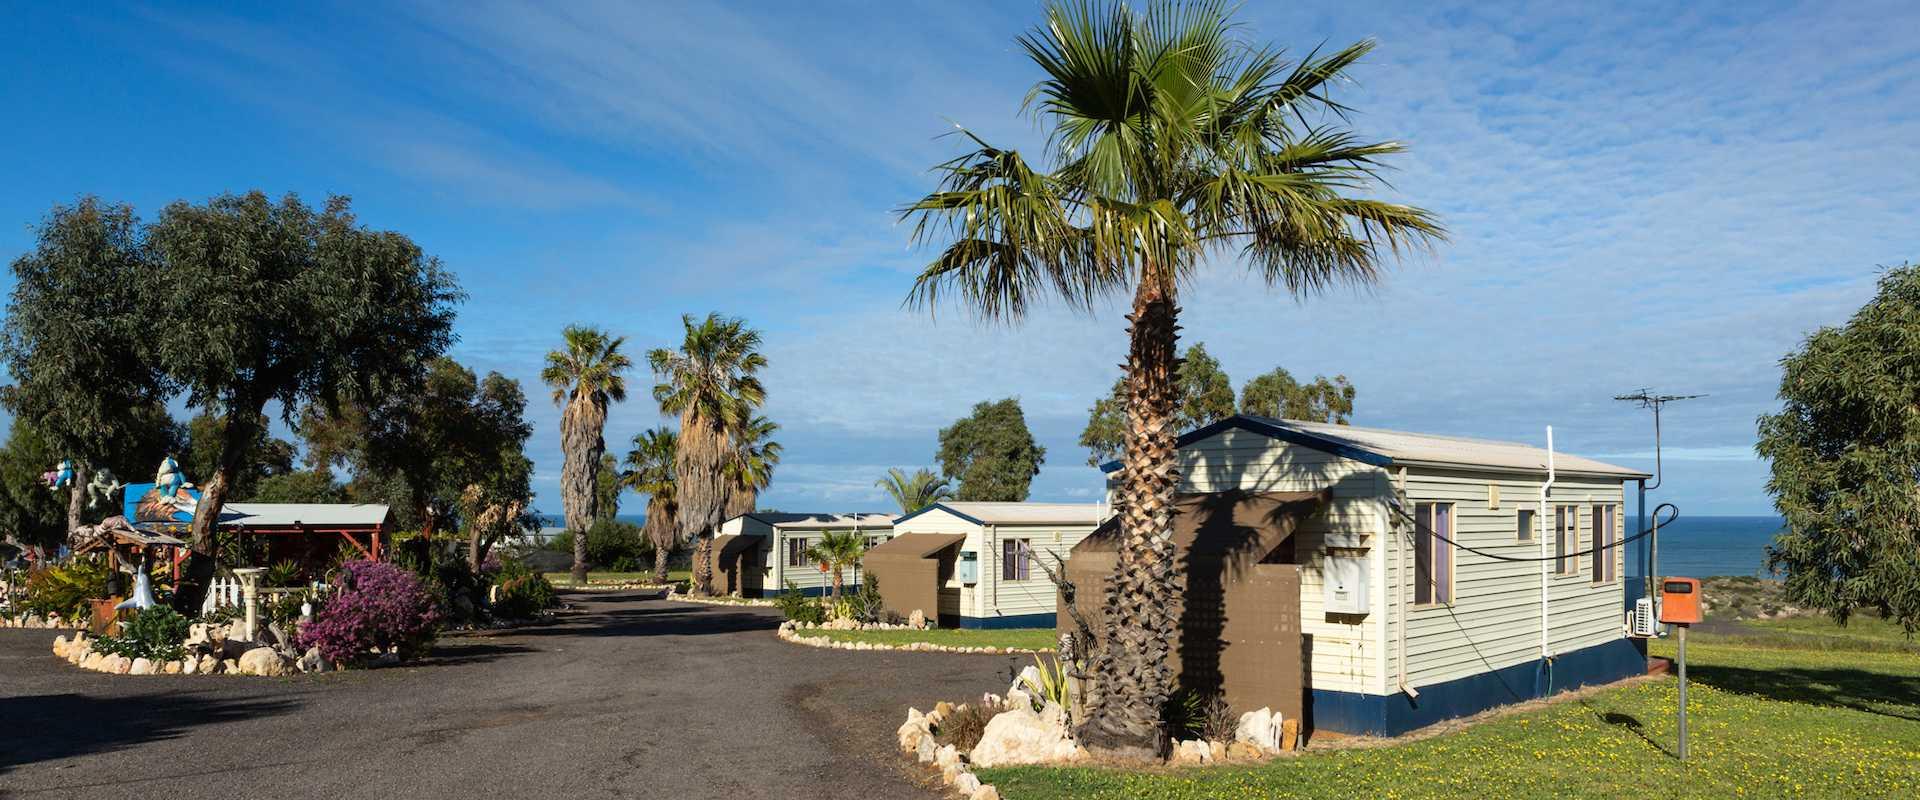 Kui Parks, Drummond Cove Holiday Park, Geraldton WA